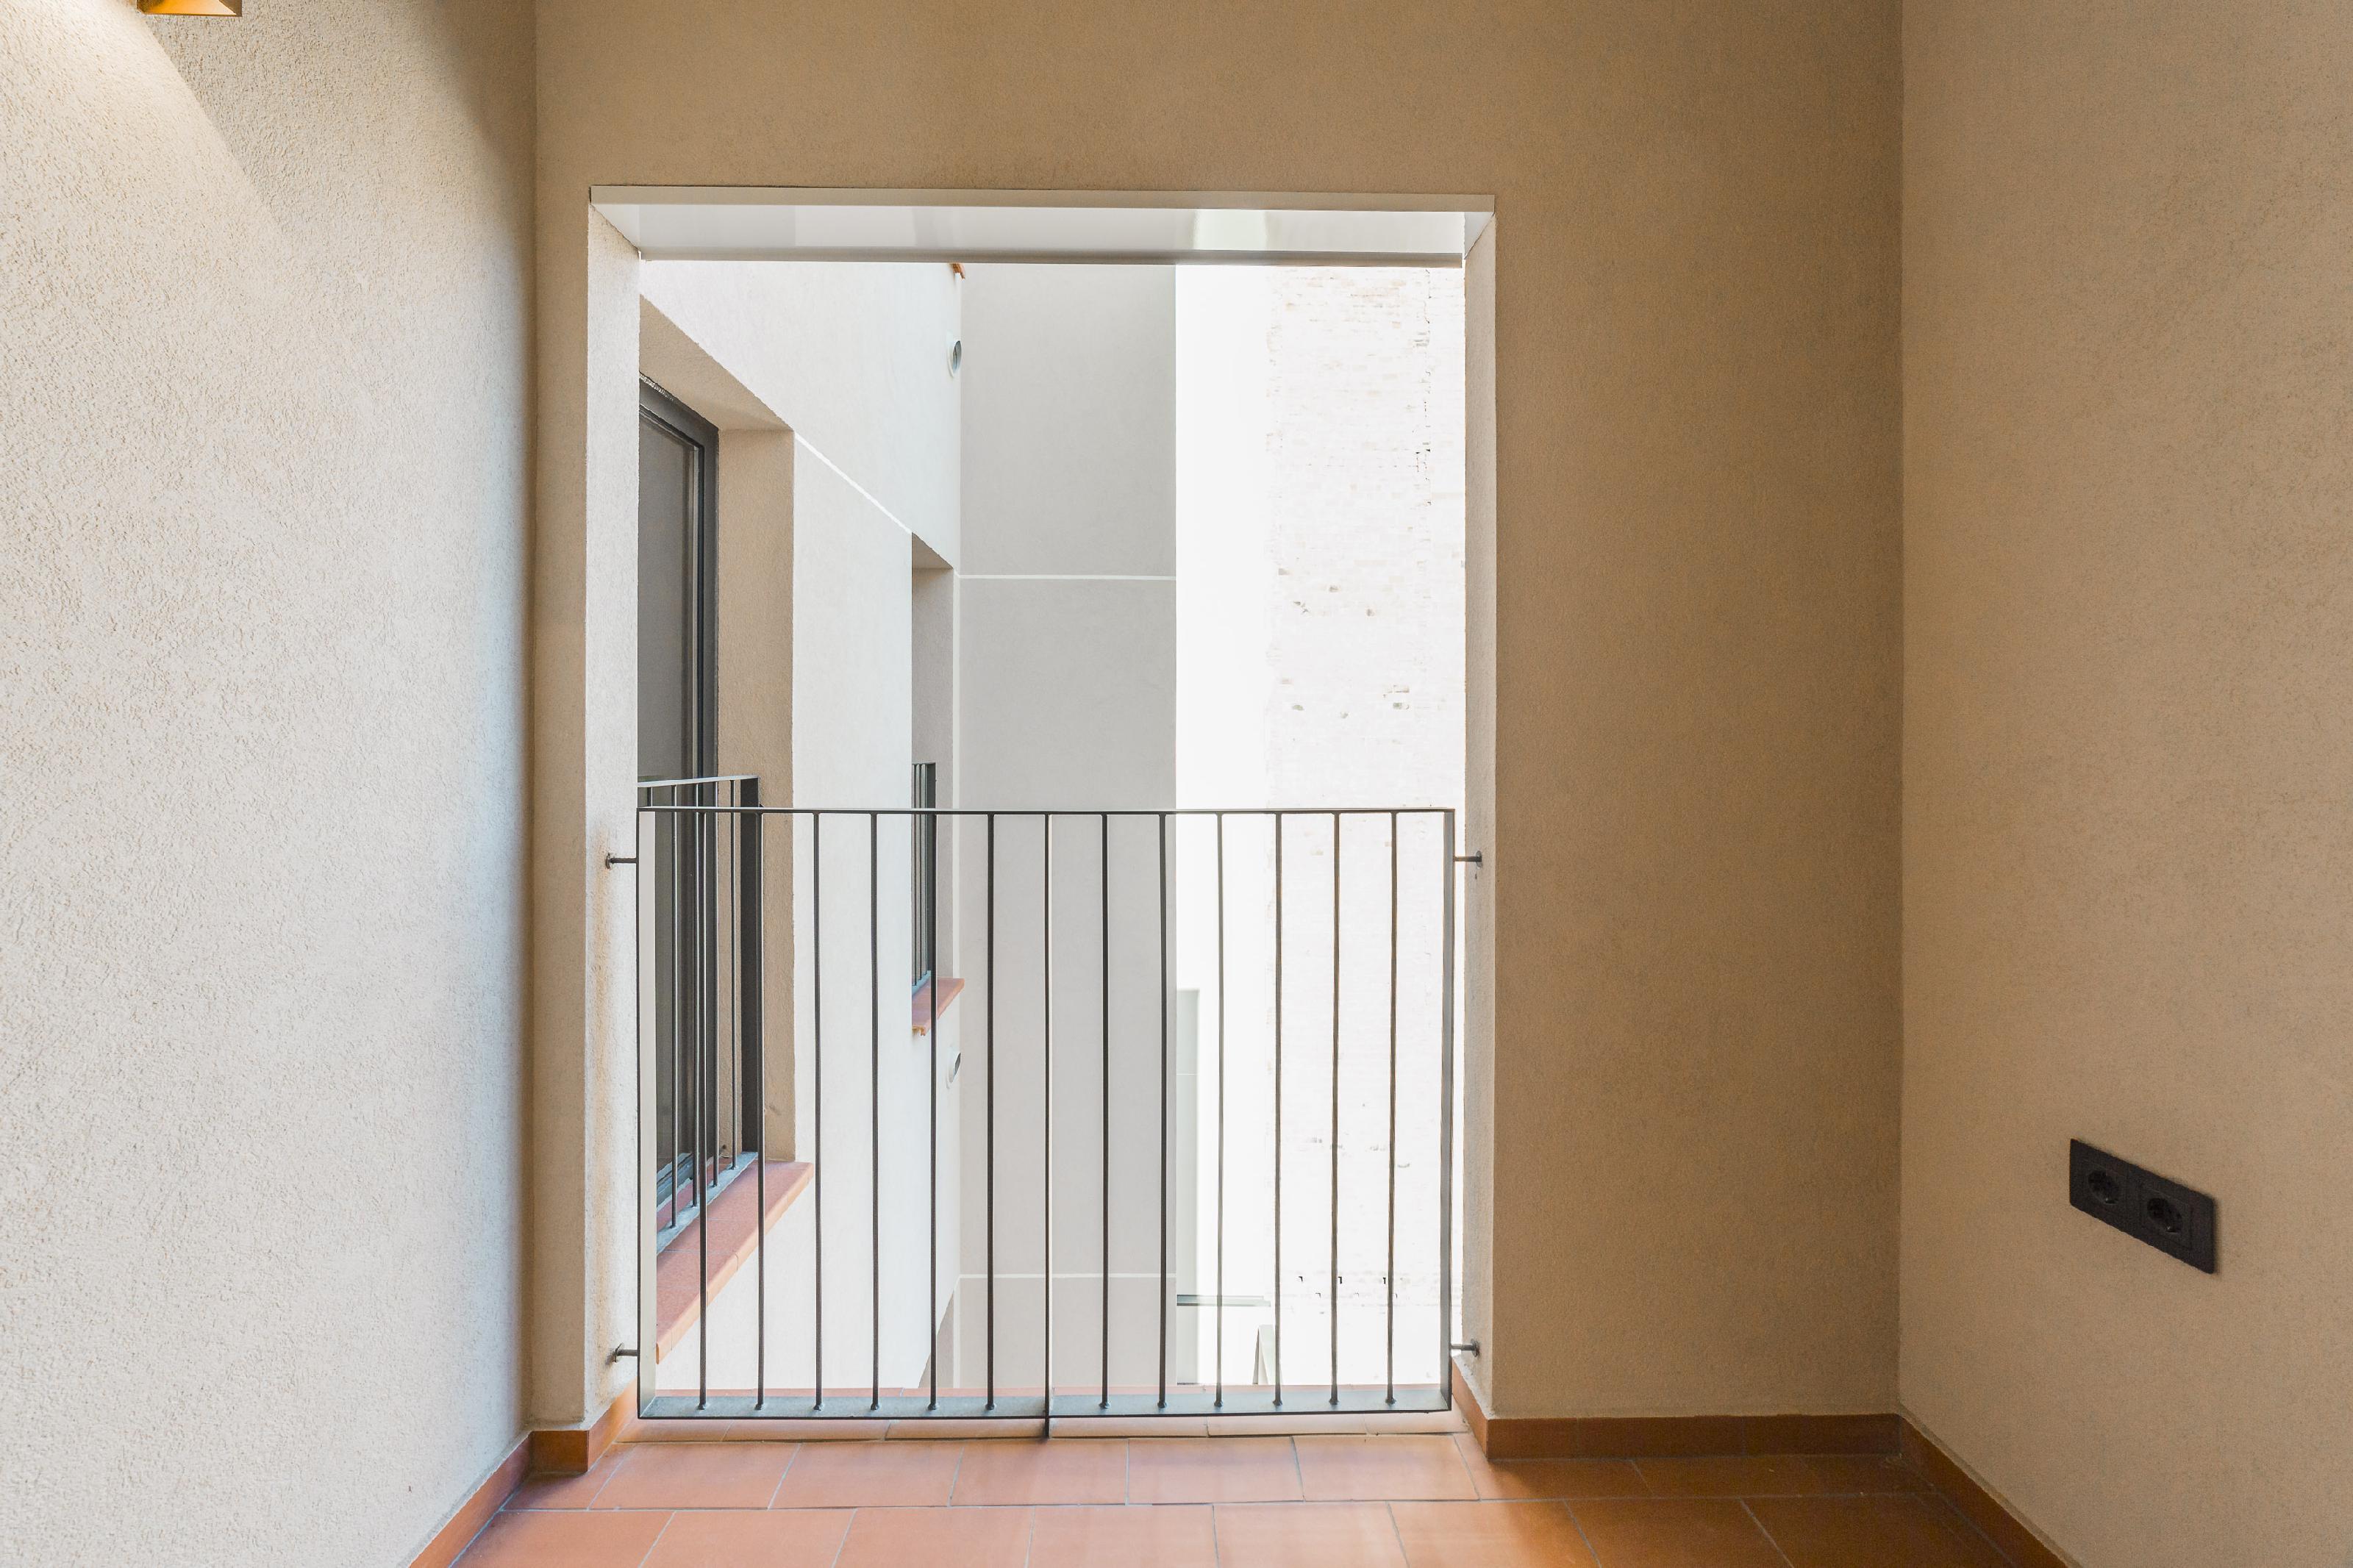 182456 Apartamento en venda en Eixample, Antiga Esquerre Eixample 21